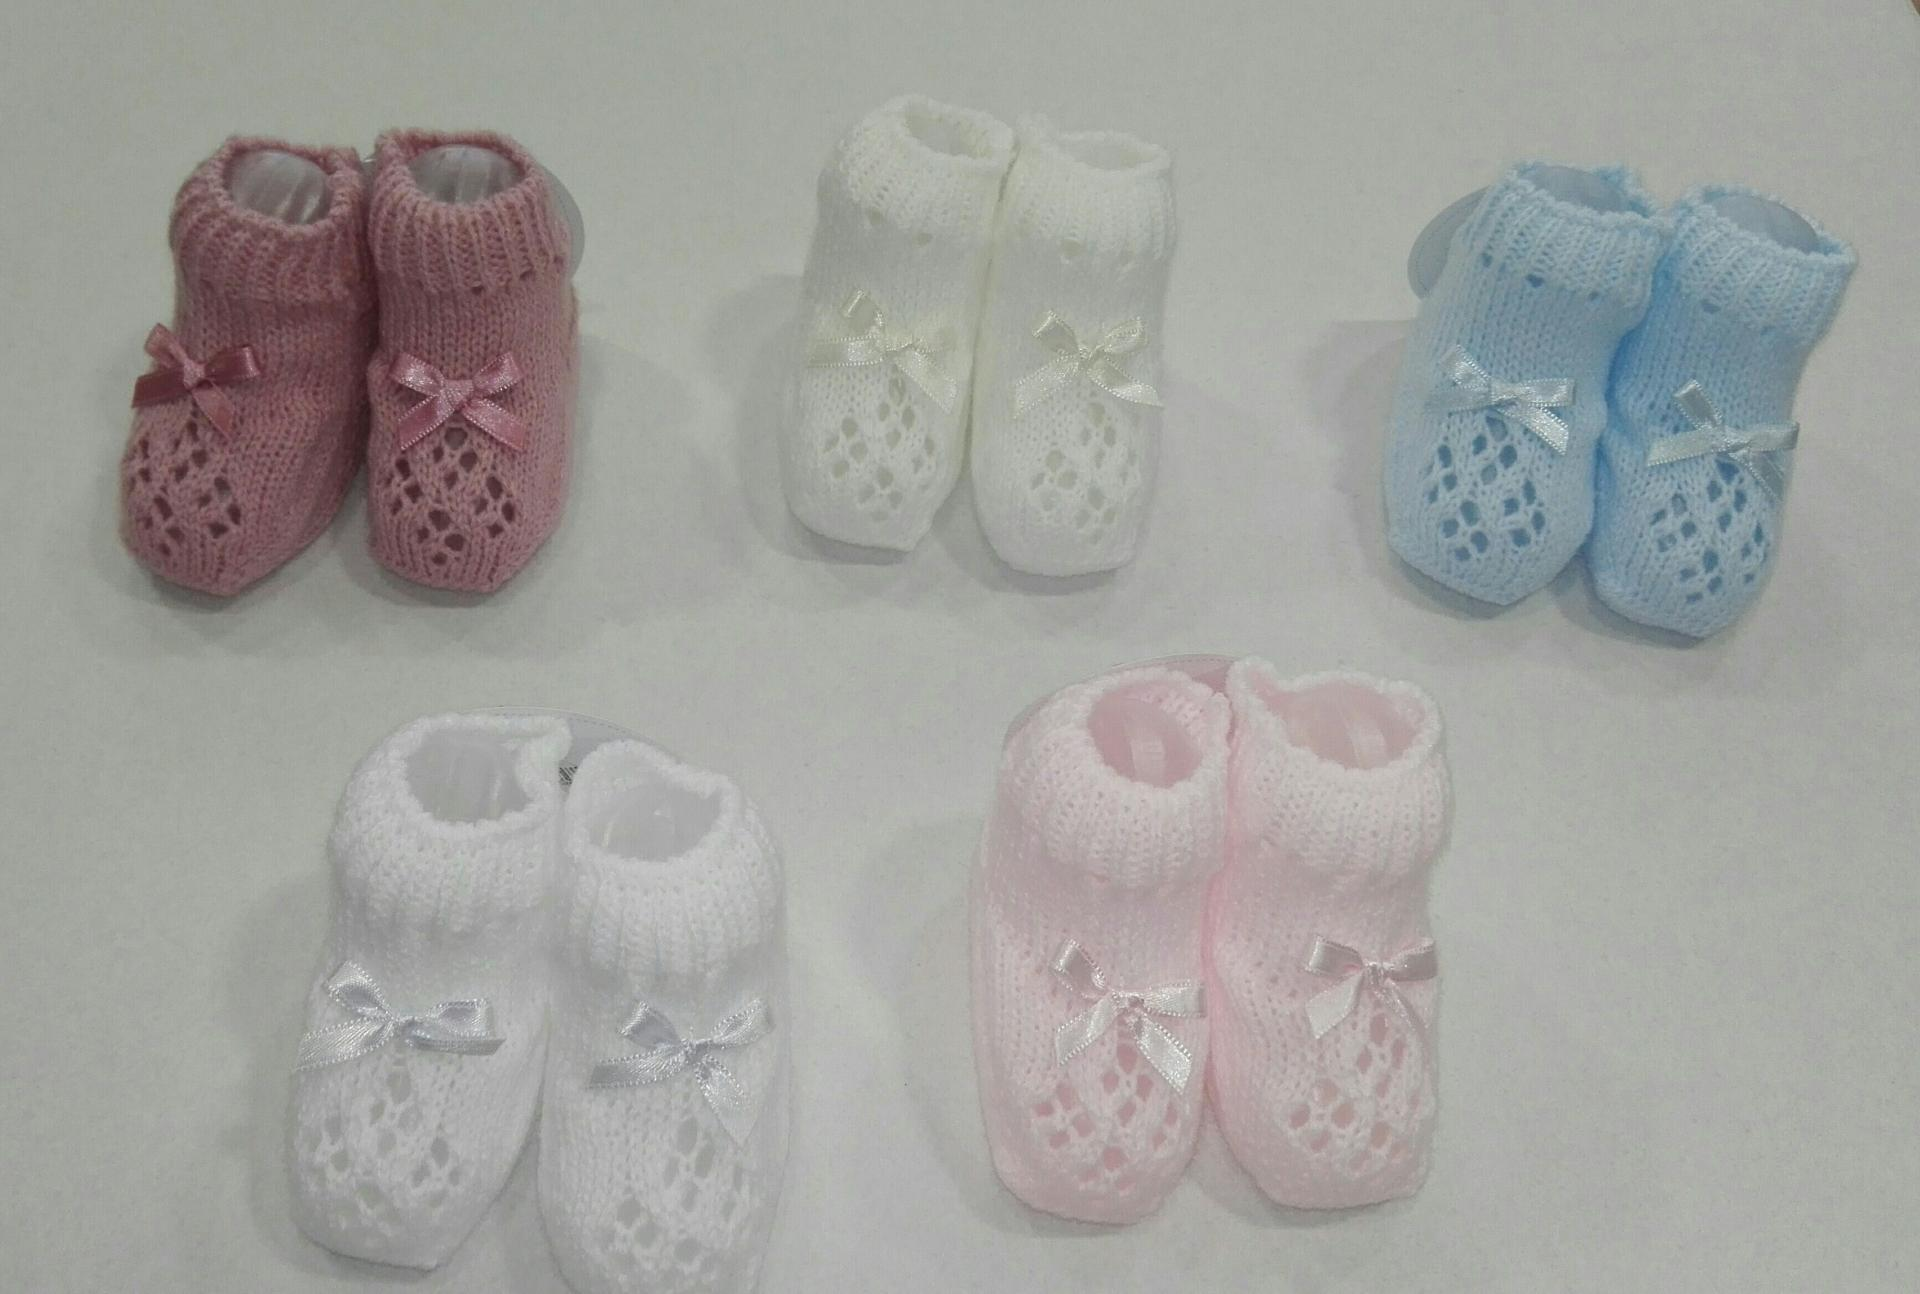 Botita patuco tricot varios colores Juliana